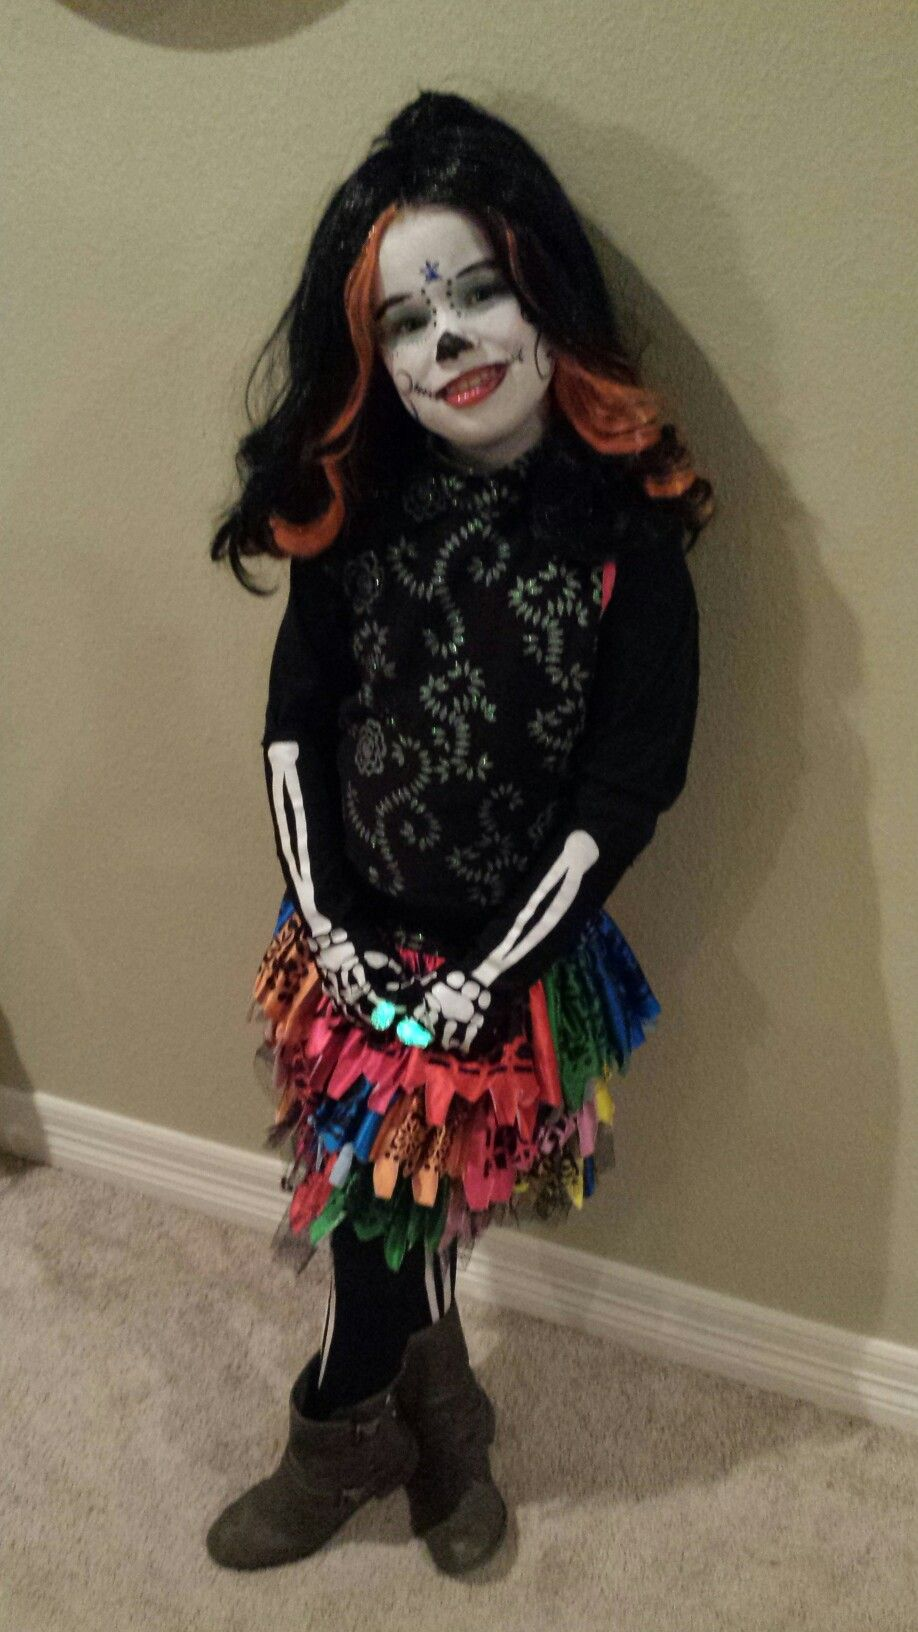 Skelita costume from last Halloween